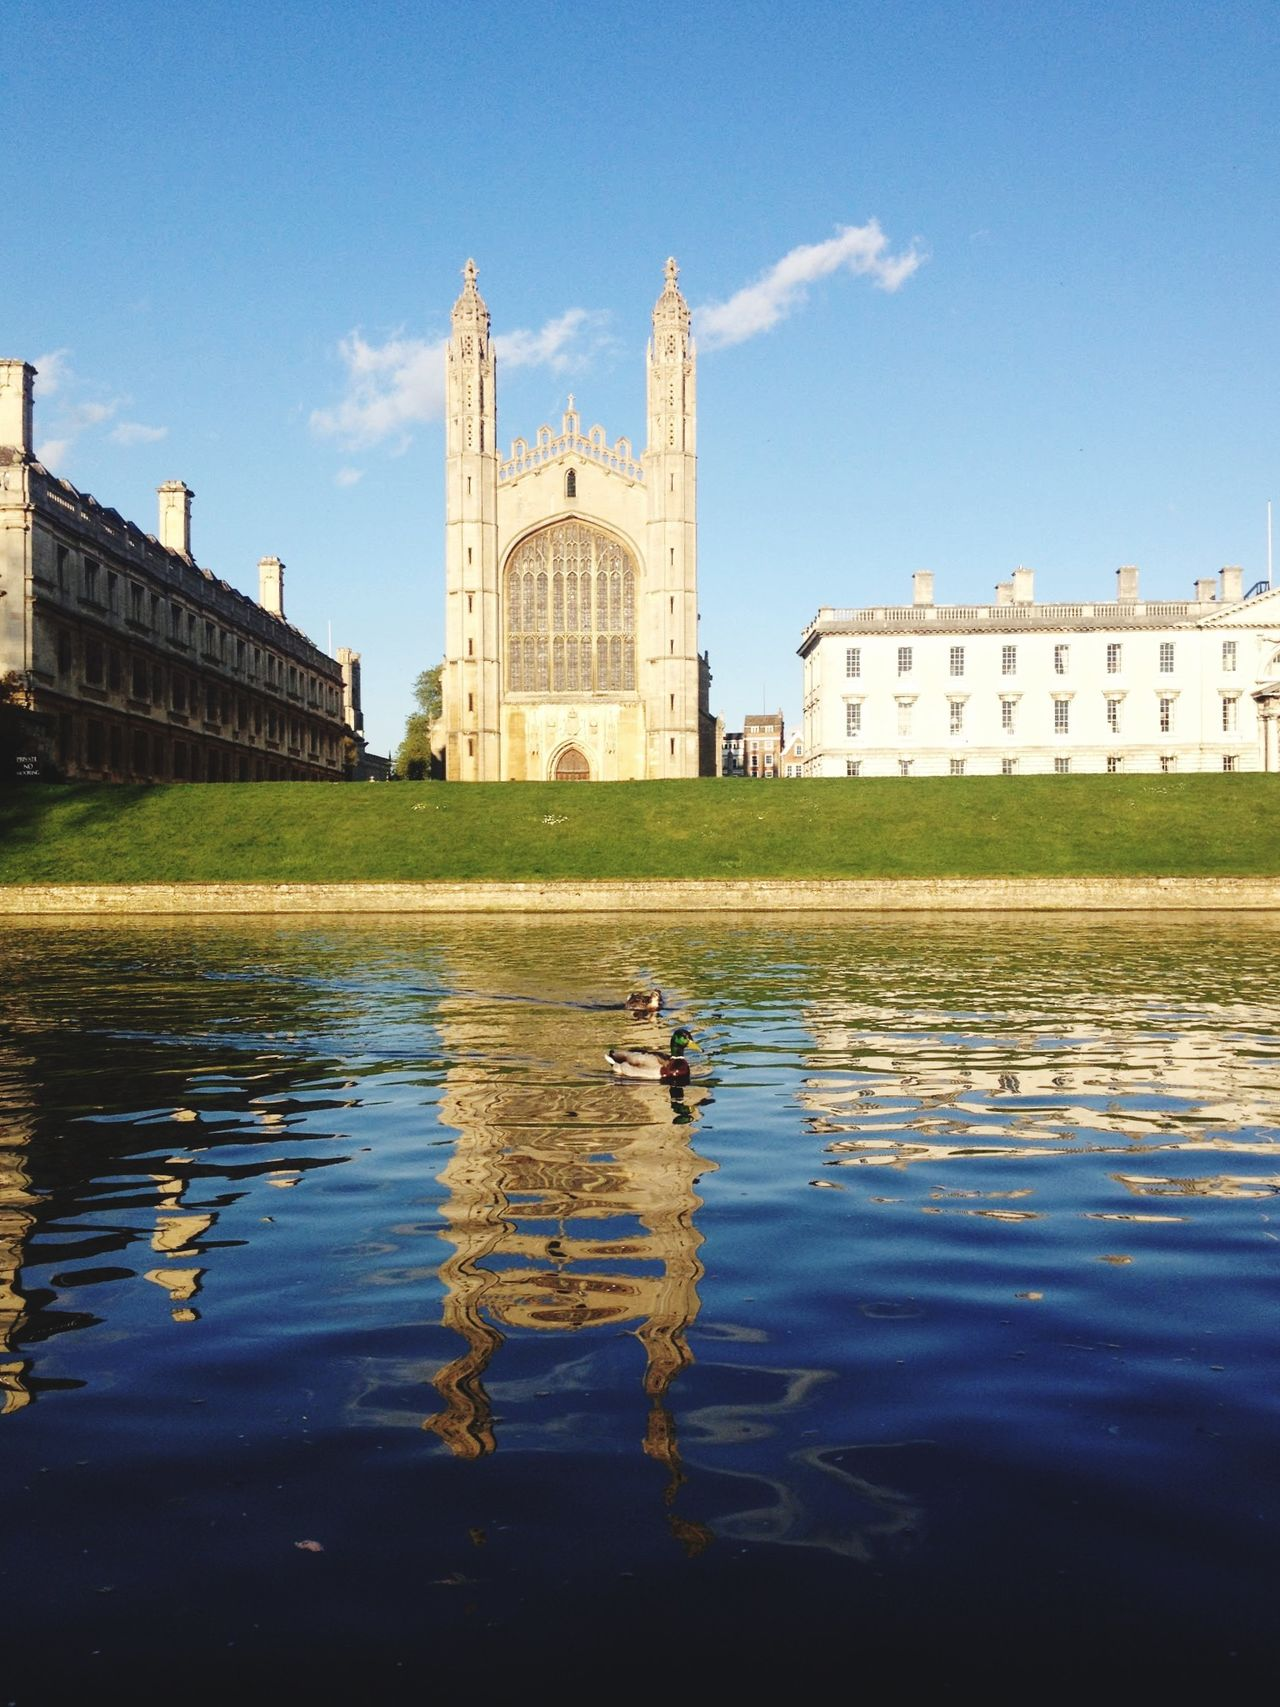 King's College Chapel River Ducks Landmark Water Reflections